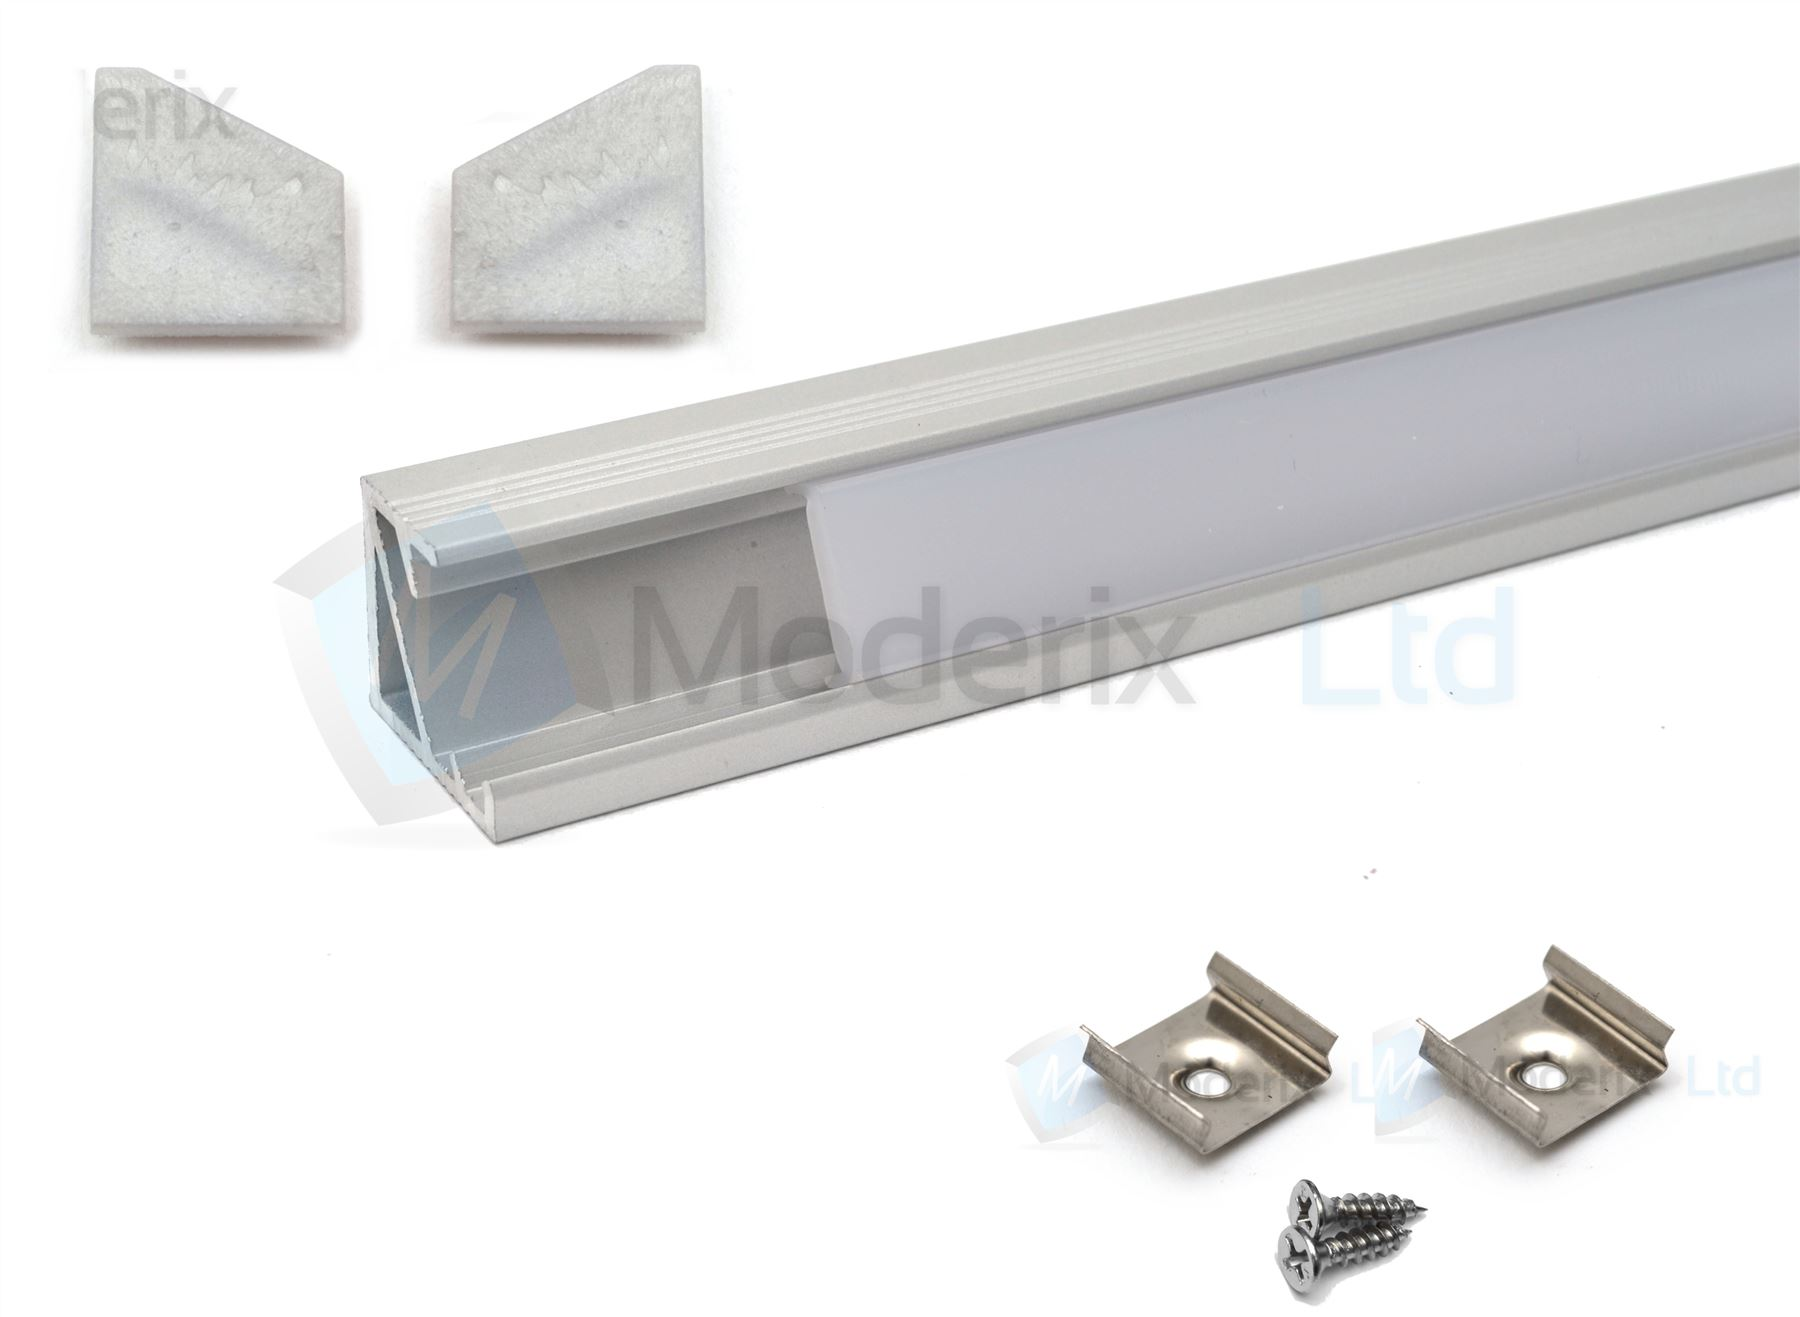 Perfil de aluminio para cintas de leds con difusor blanco - Perfil aluminio blanco ...